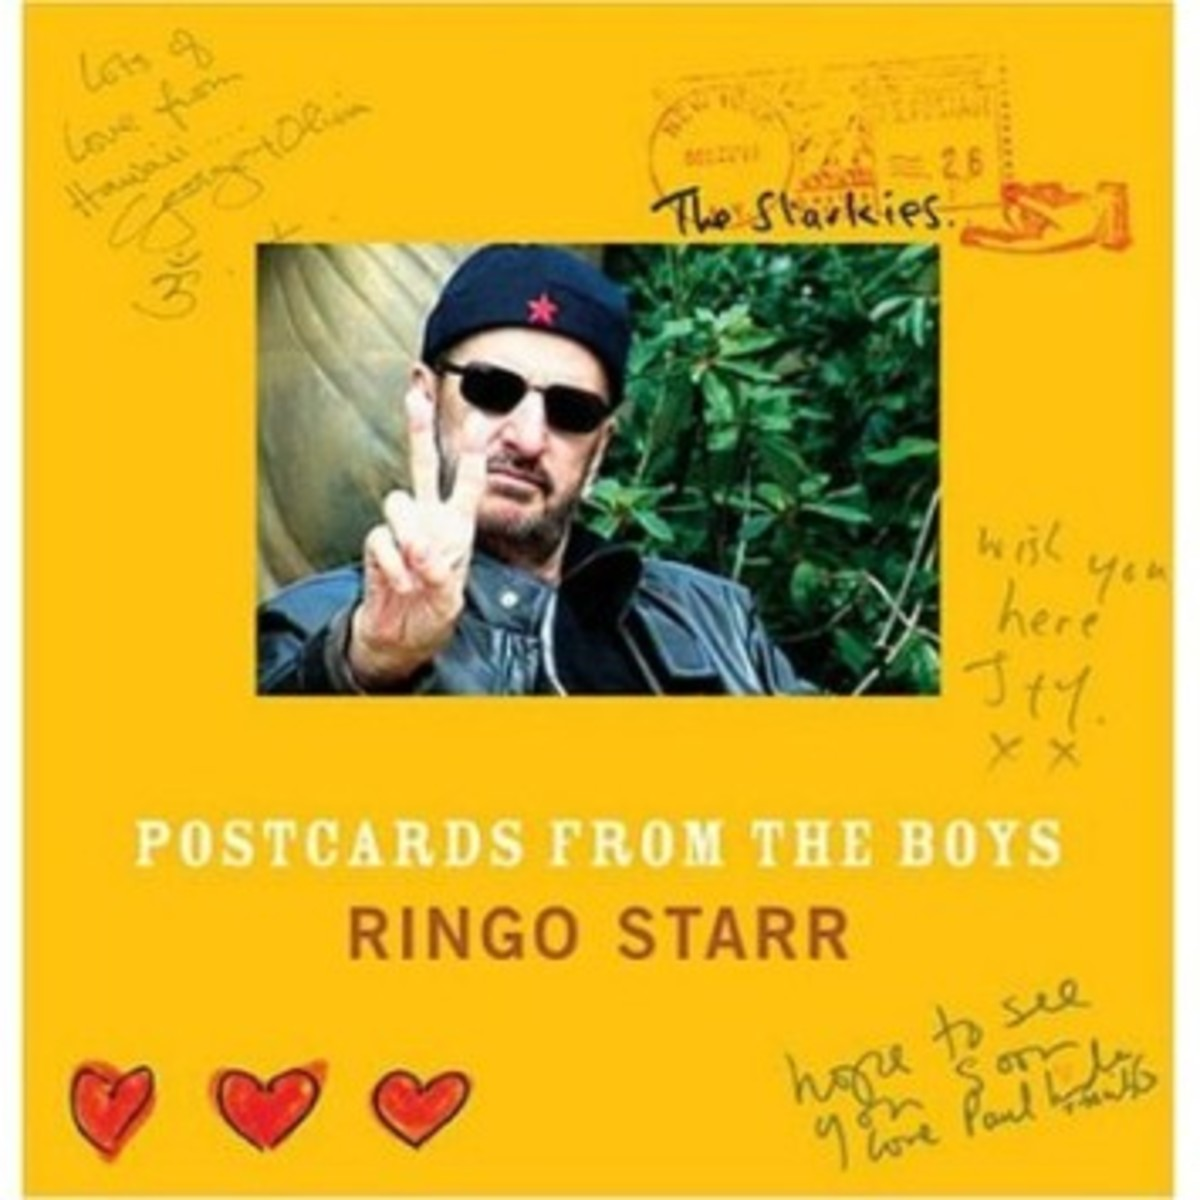 PostcardsFromTheBoys